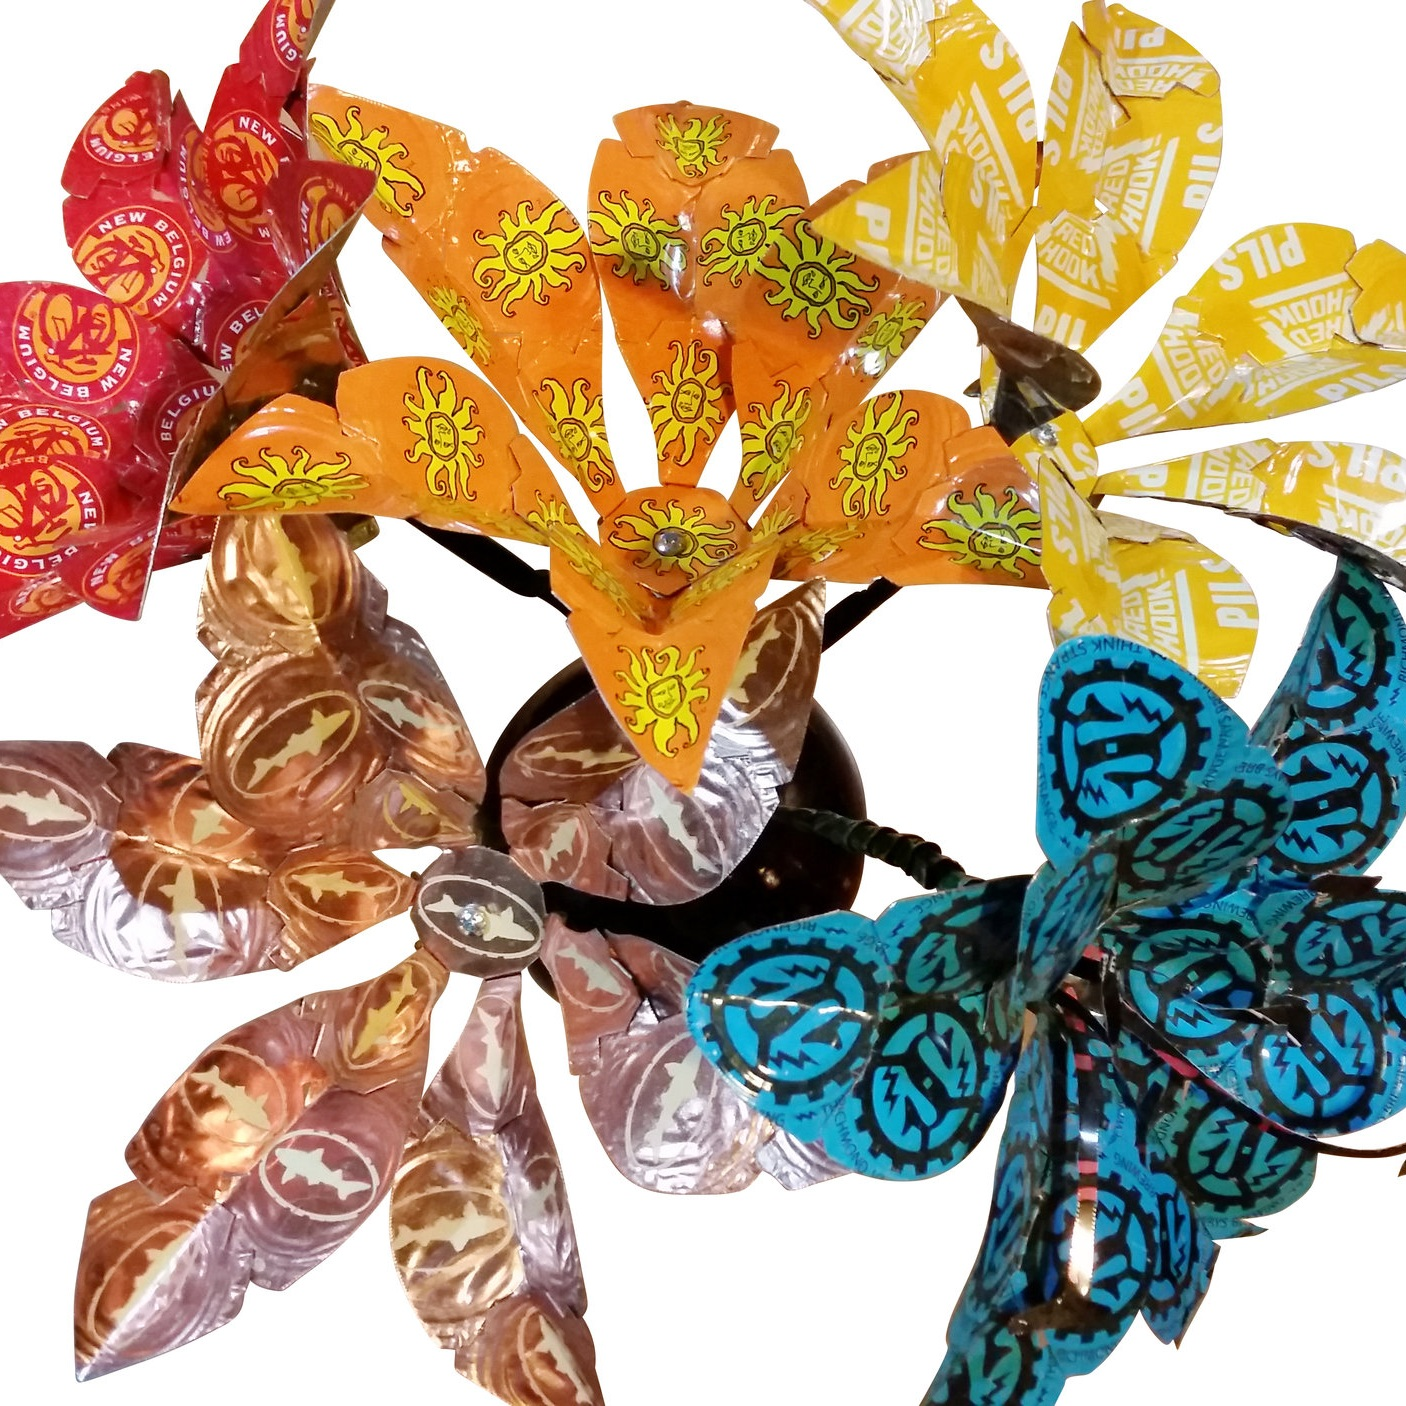 Tiger Lilies copy.jpg